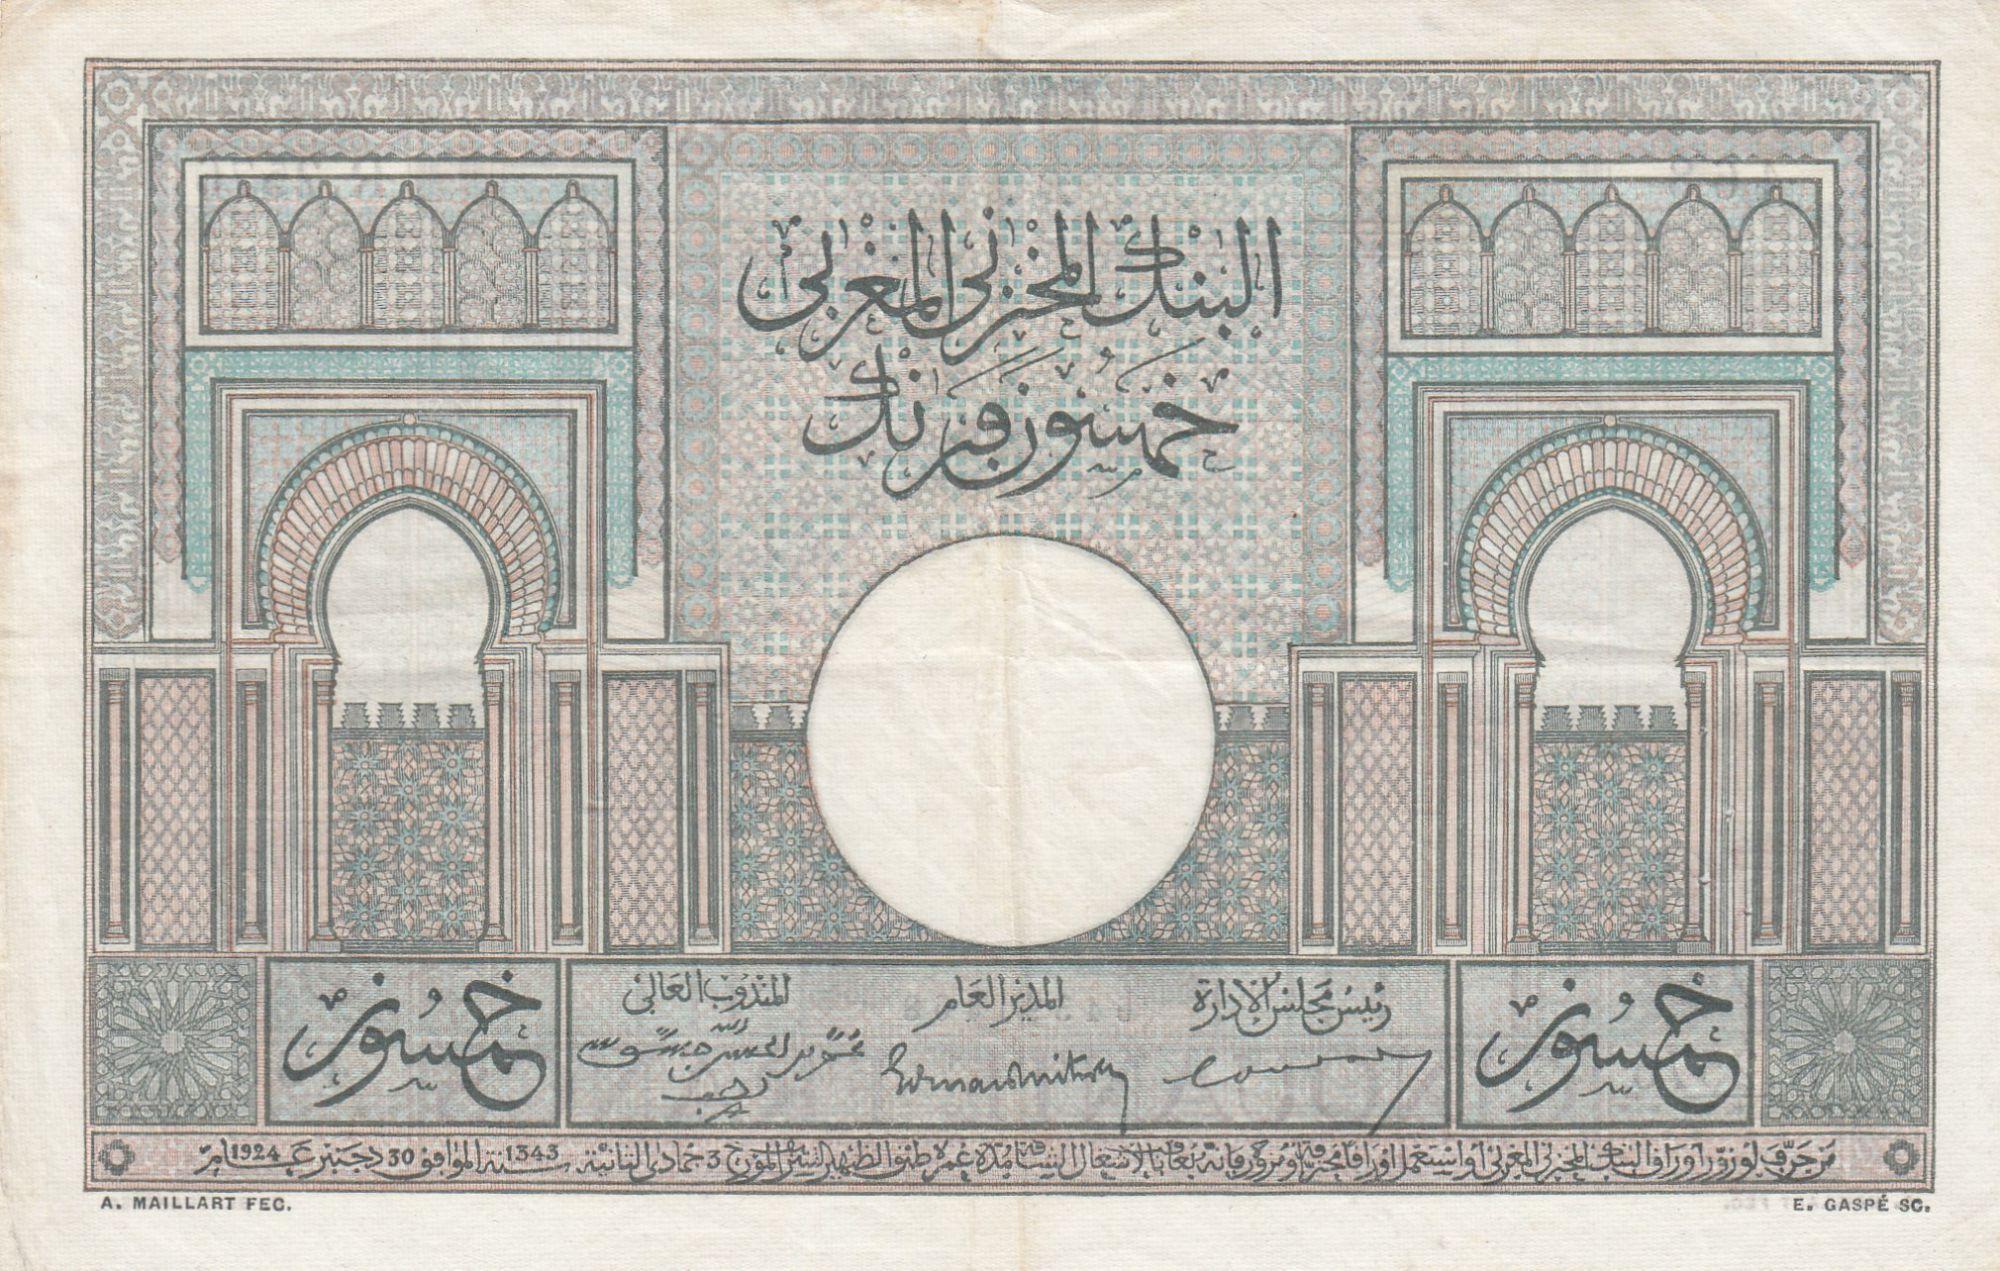 Maroc 50 Francs 28-10-1947 -  Grand Format - TTB +  - Série R.2576 - P.21